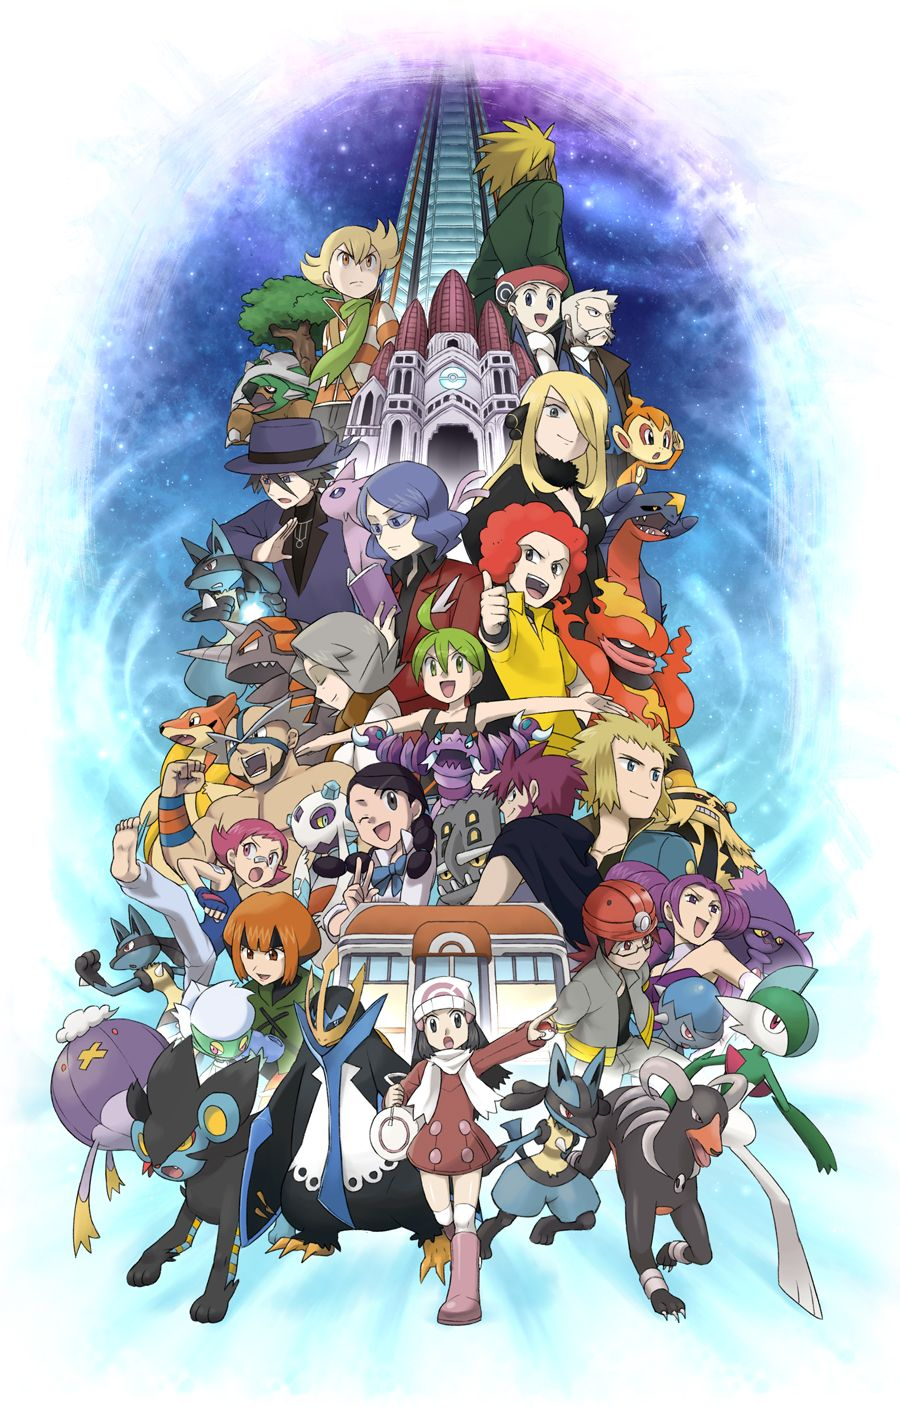 bastiodon, chimchar, cranidos, denji, diamond, and others (pokemon …